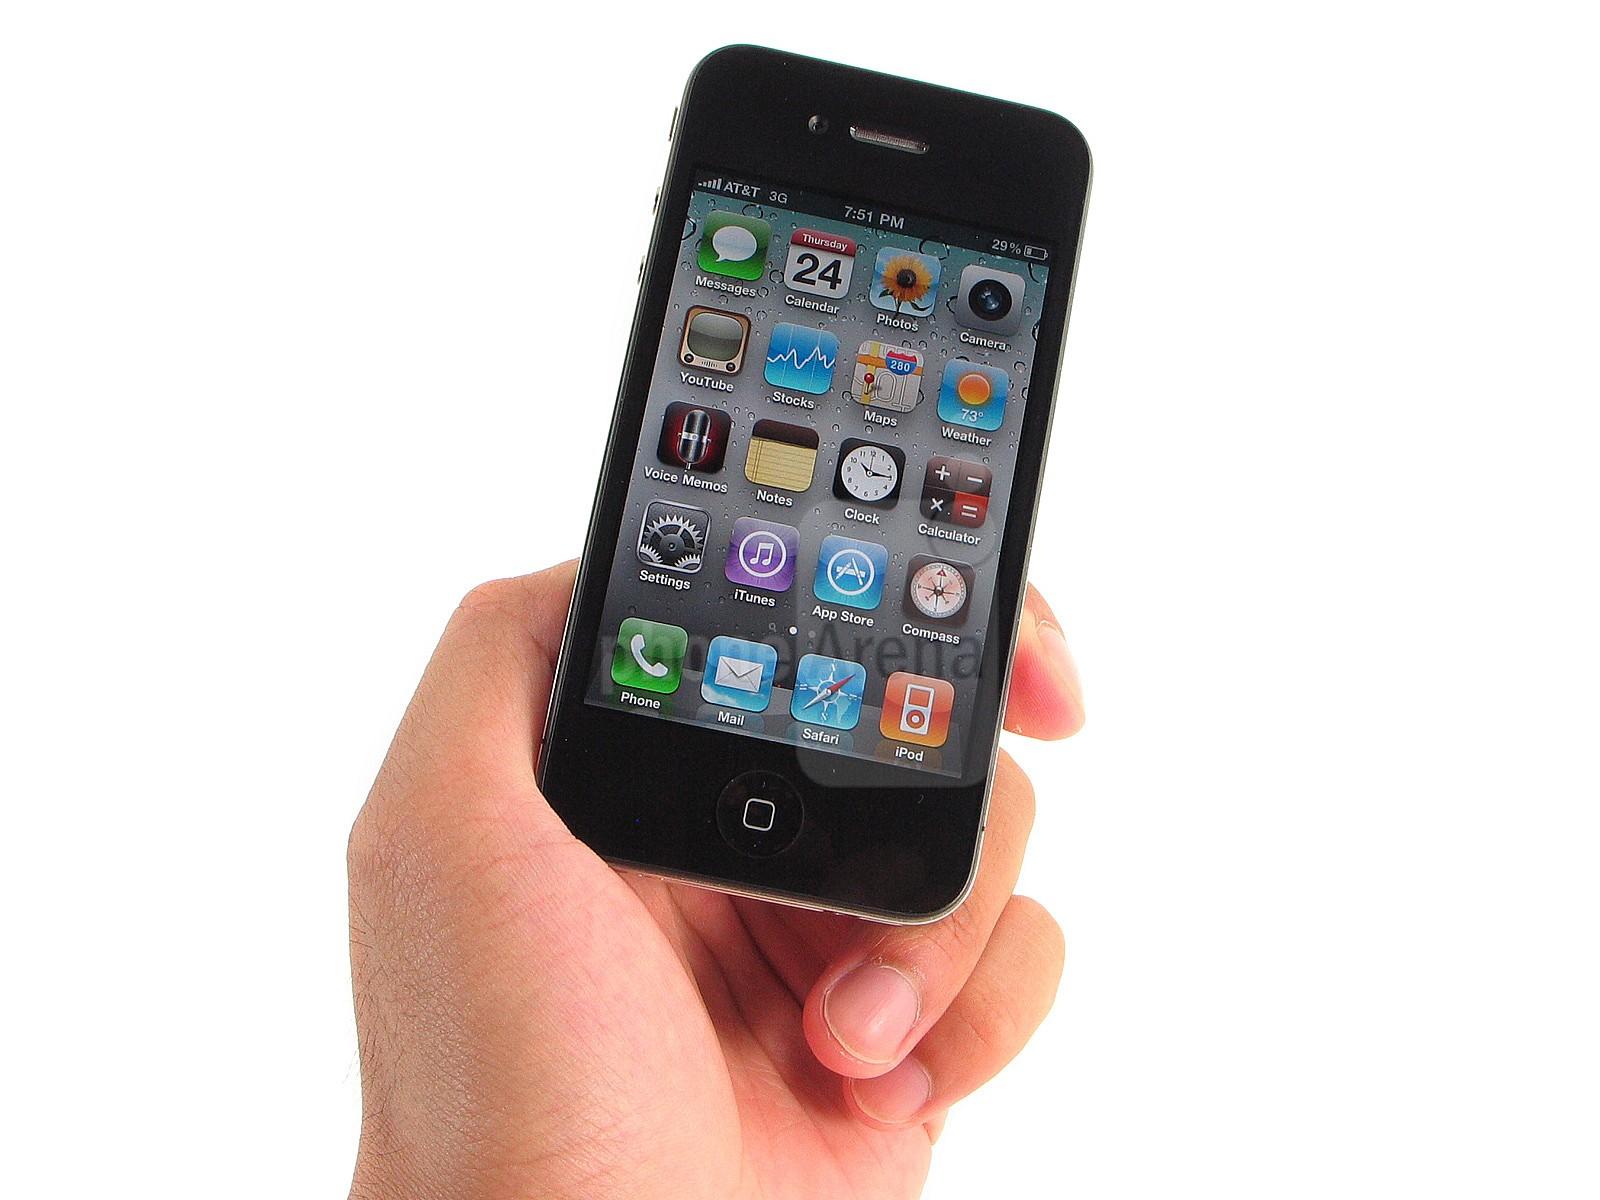 Apple iPhone 4 5